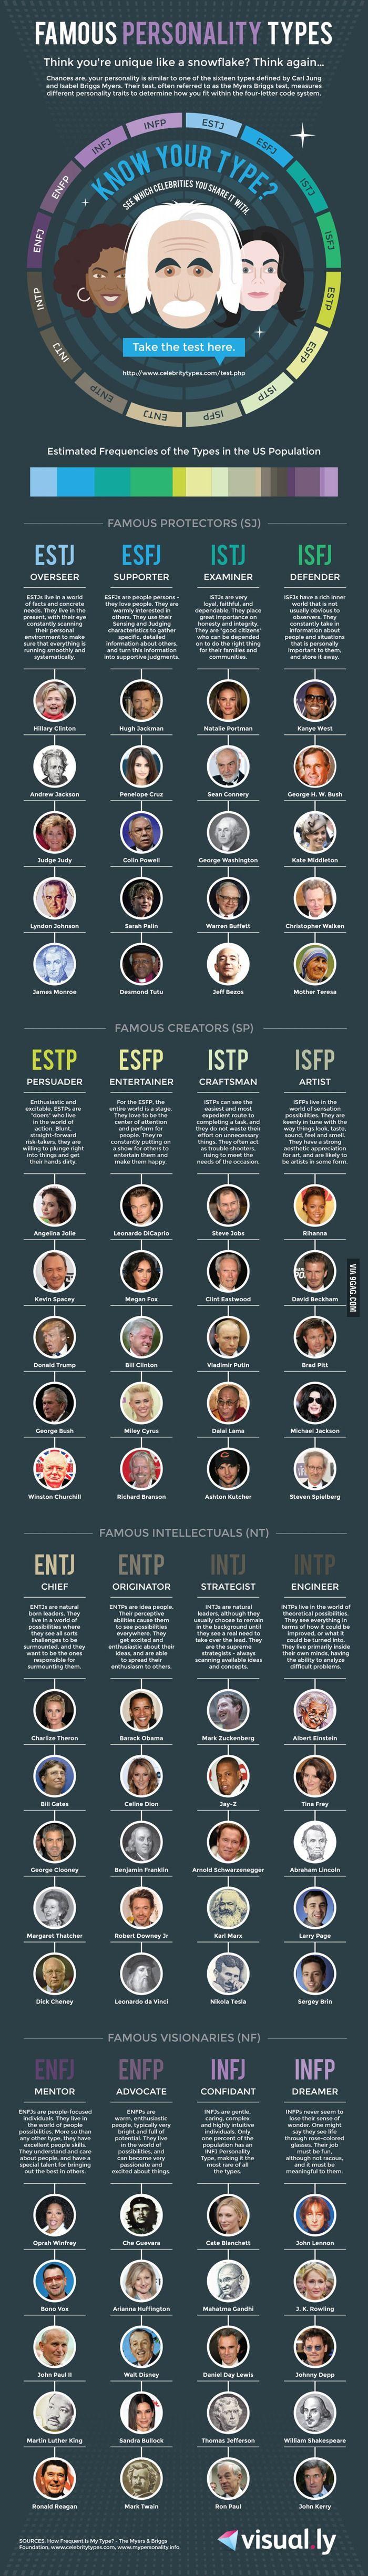 ENFP of the population; Che Guevara,Arianna Huffington, Walt Disney, Sandra Bullock, Mark Twain.